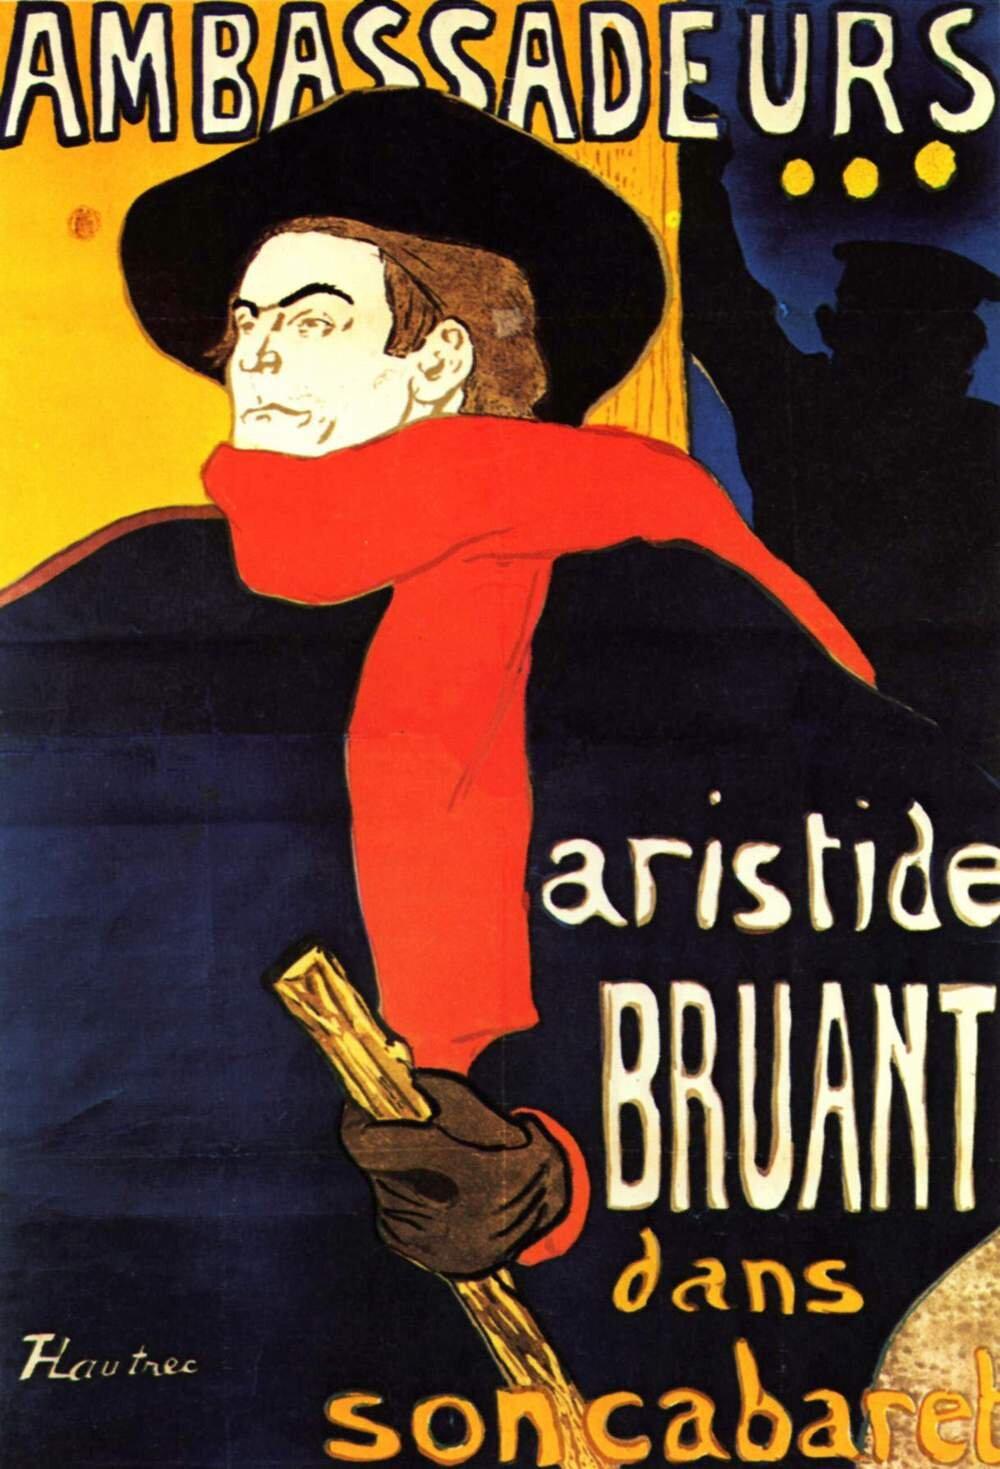 Ambassadeurs: Aristide Bruant dans son cabaret Ilustracja 2 Źródło: Henri Toulouse-Lautrec, Ambassadeurs: Aristide Bruant dans son cabaret, 1892, litografia barwna, domena publiczna.